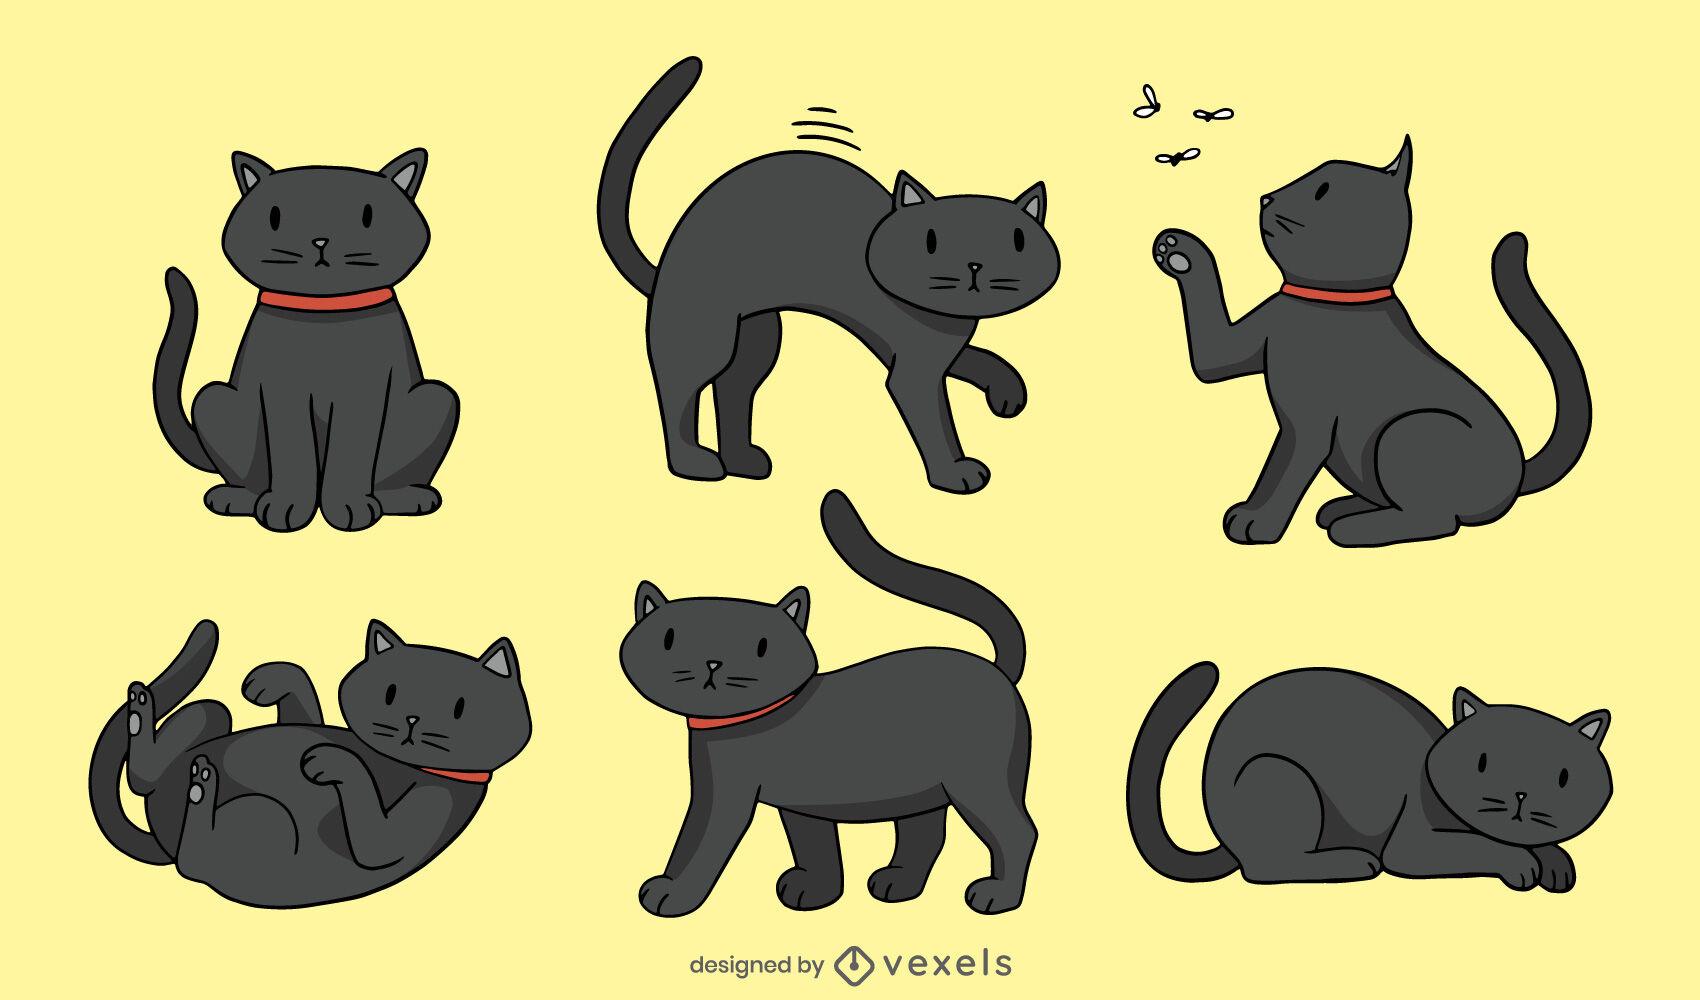 Cute black cat illustrations set